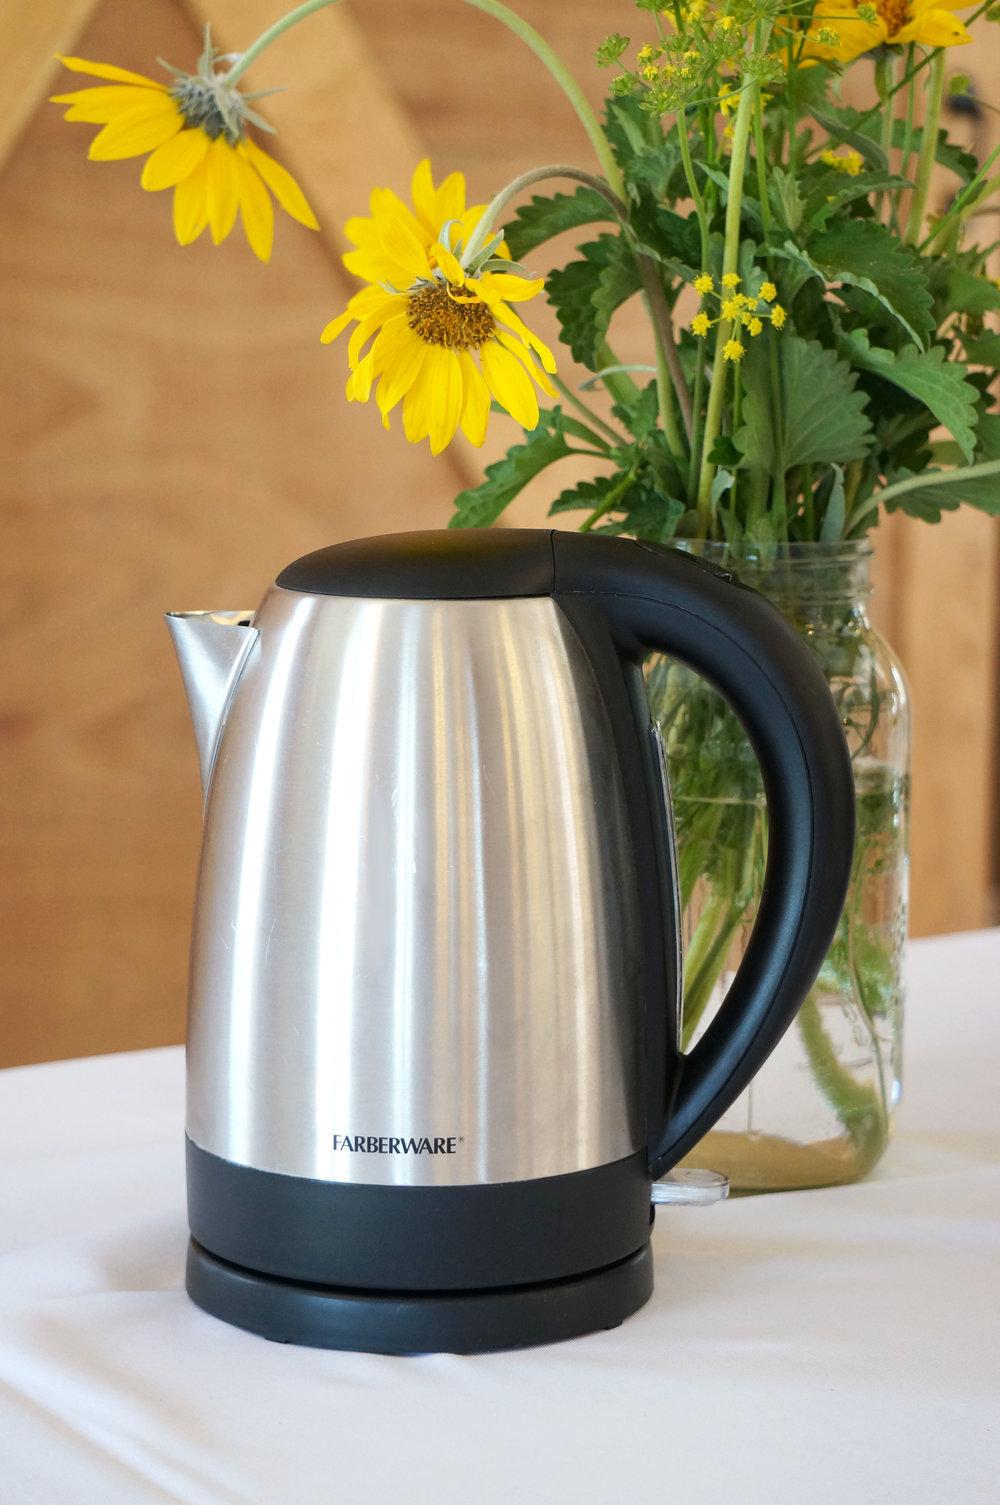 Electric Tea Kettle - $5